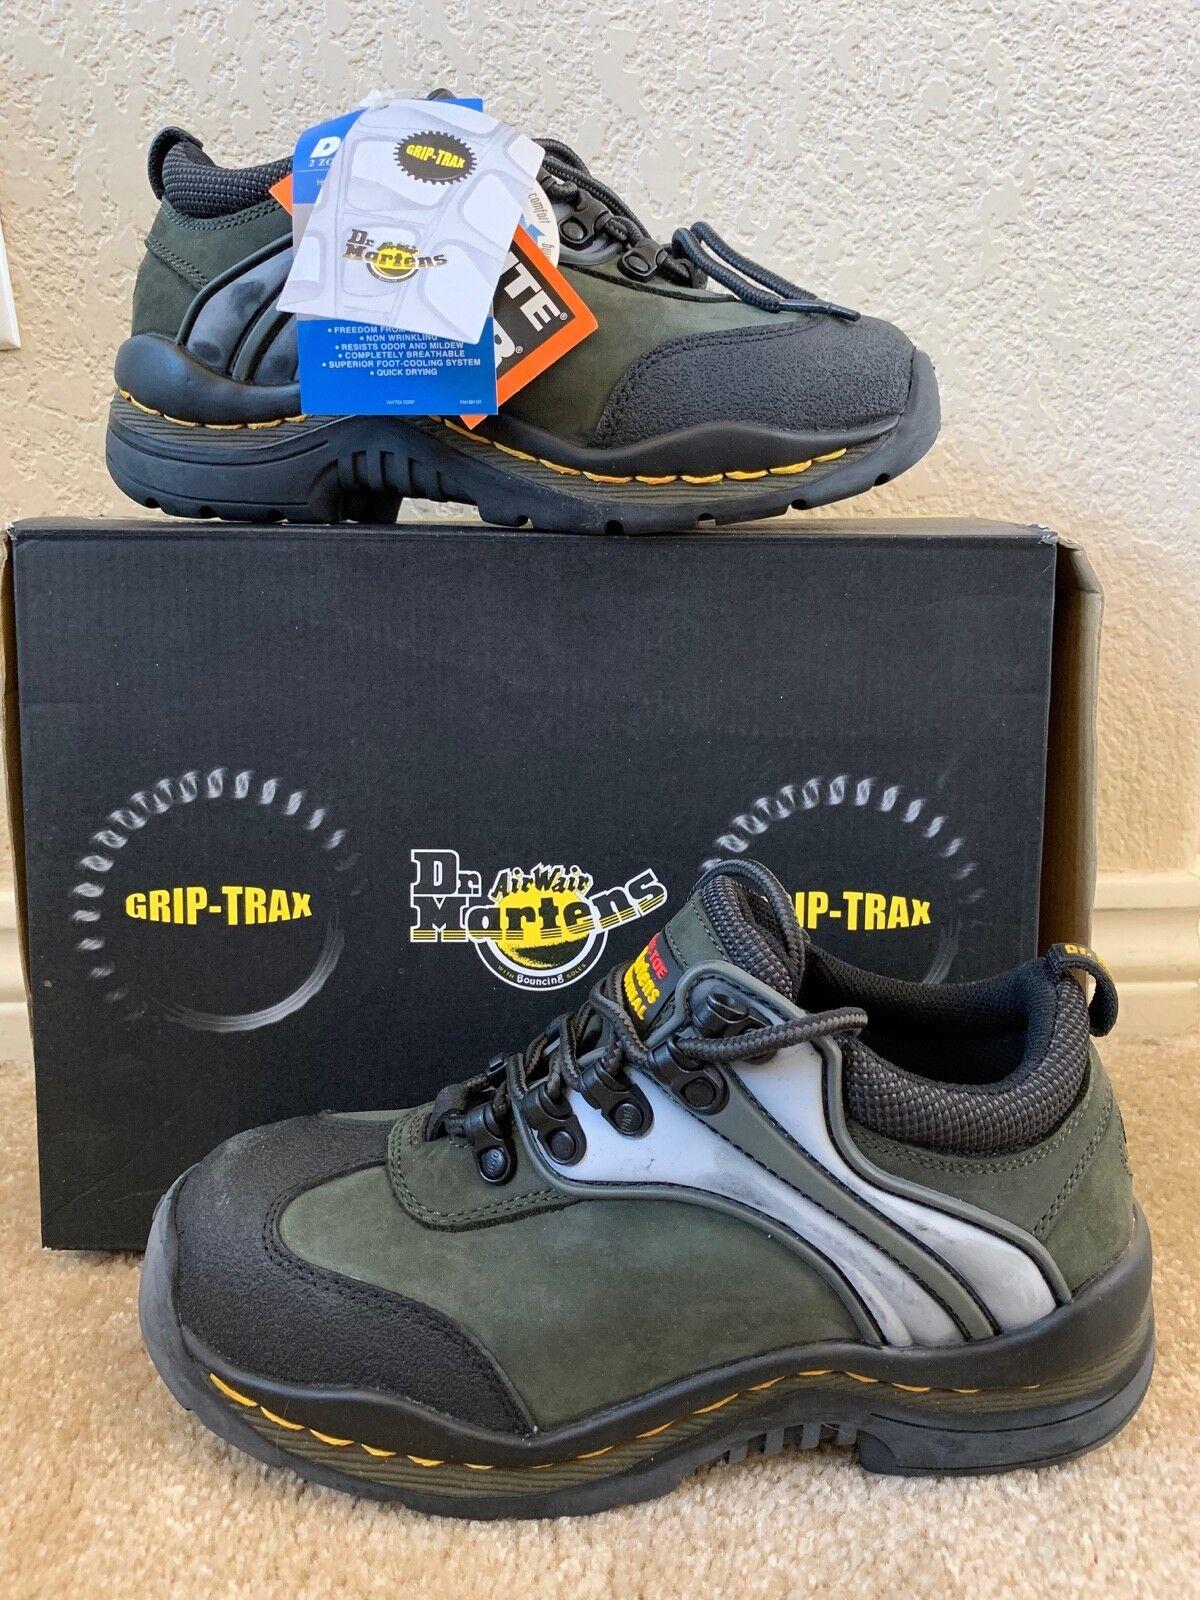 Dr. Martens Men's Steel Toe Vintage Industrial Boot Sneakers